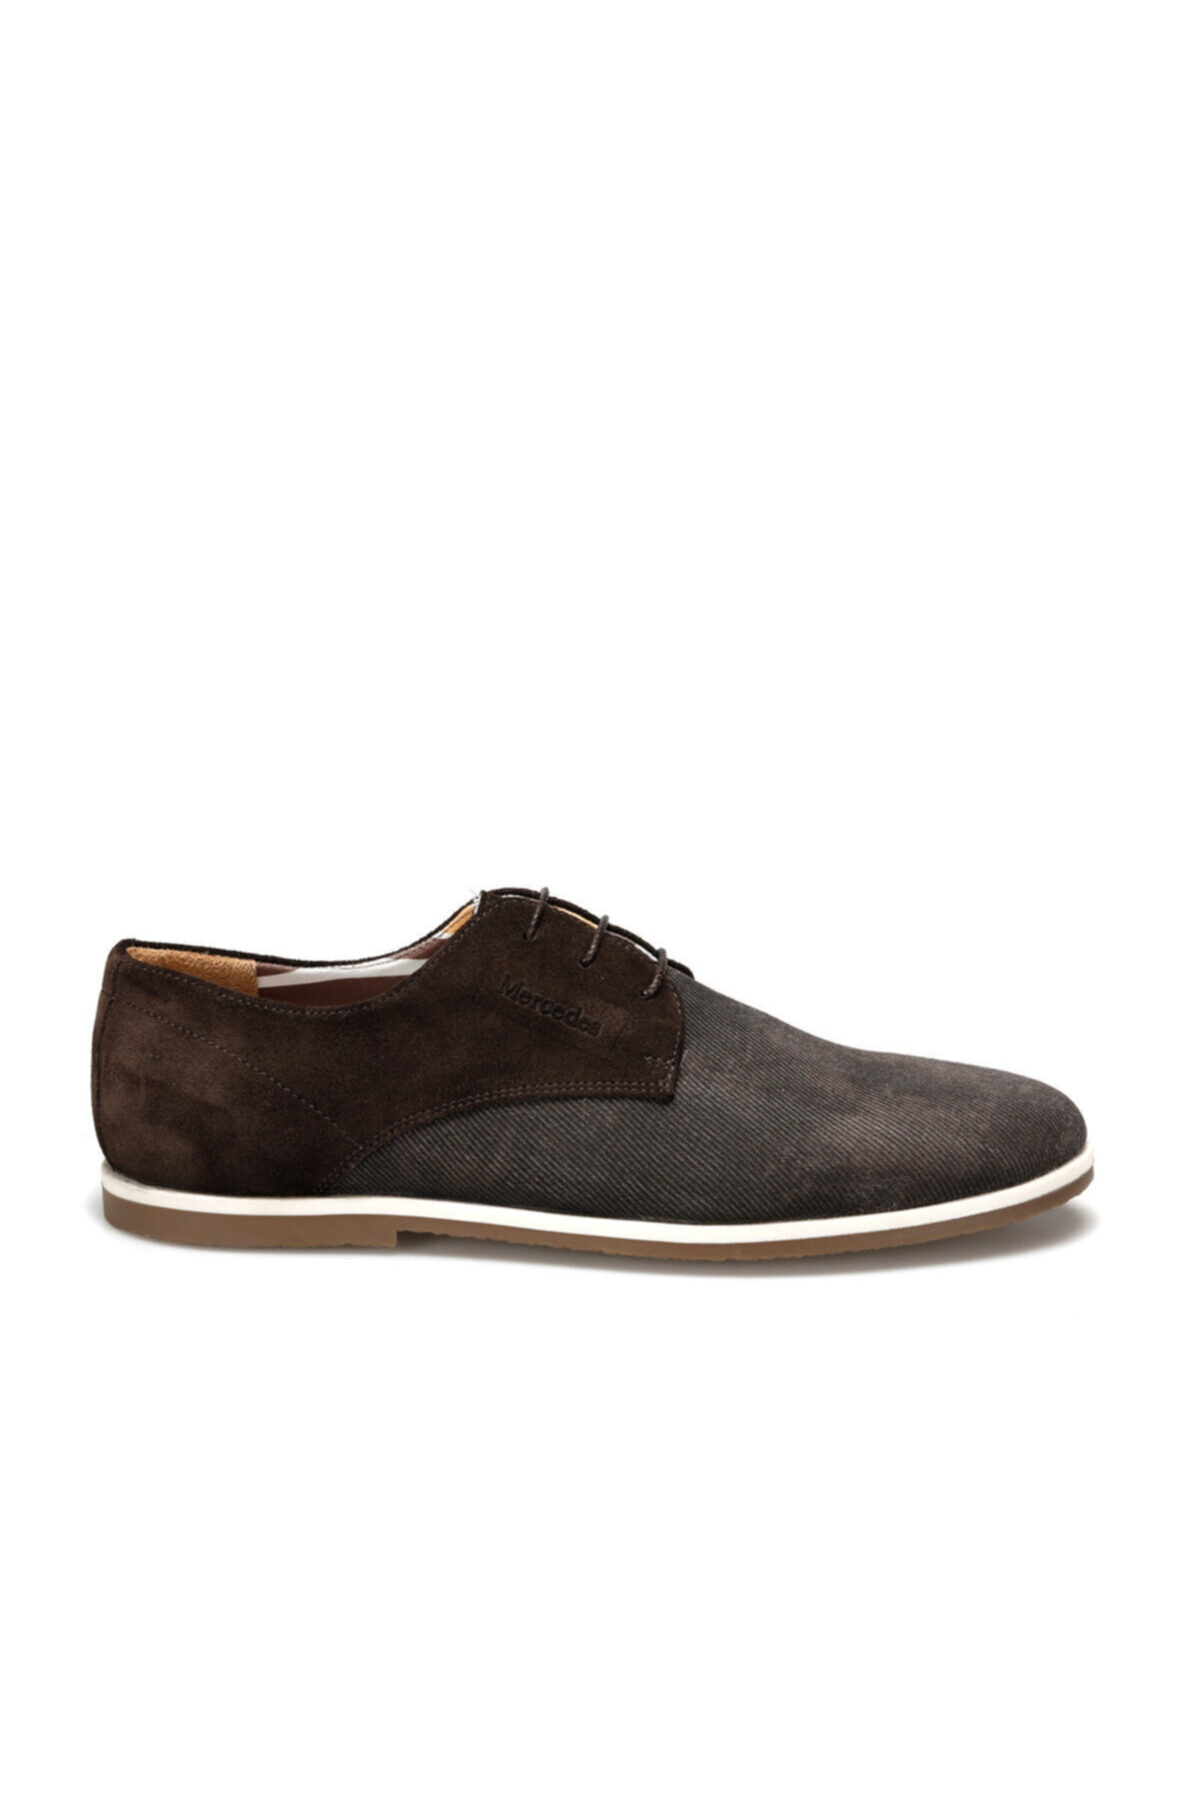 MERCEDES Erkek  Kahverengi Dress Ayakkabı 2